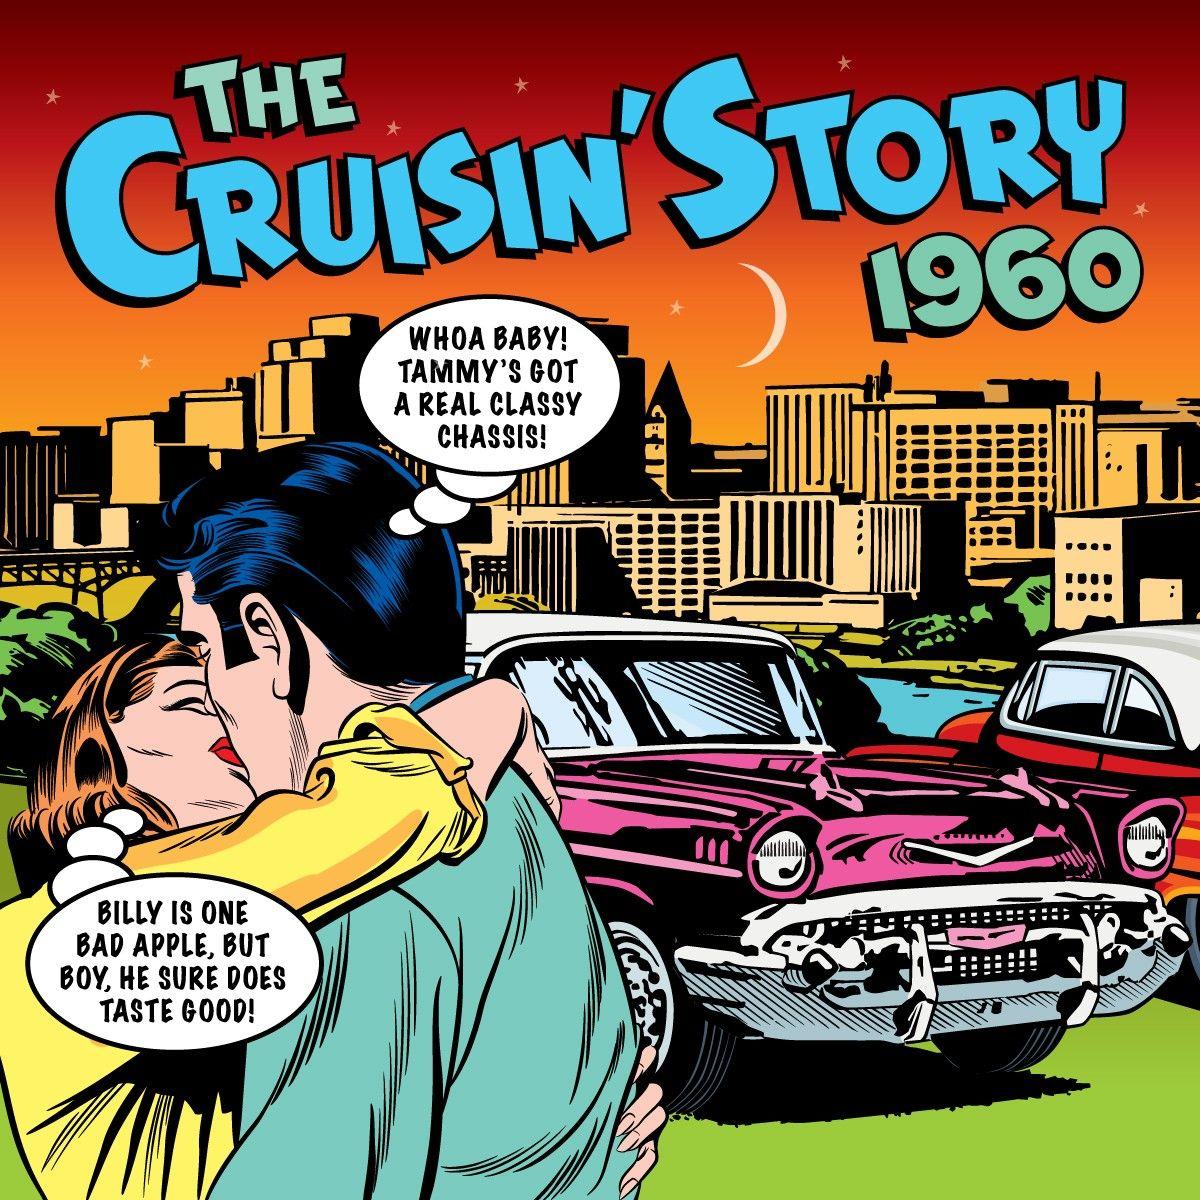 2011 The Cruisin' Story 1960 (2LP) [One Day Music